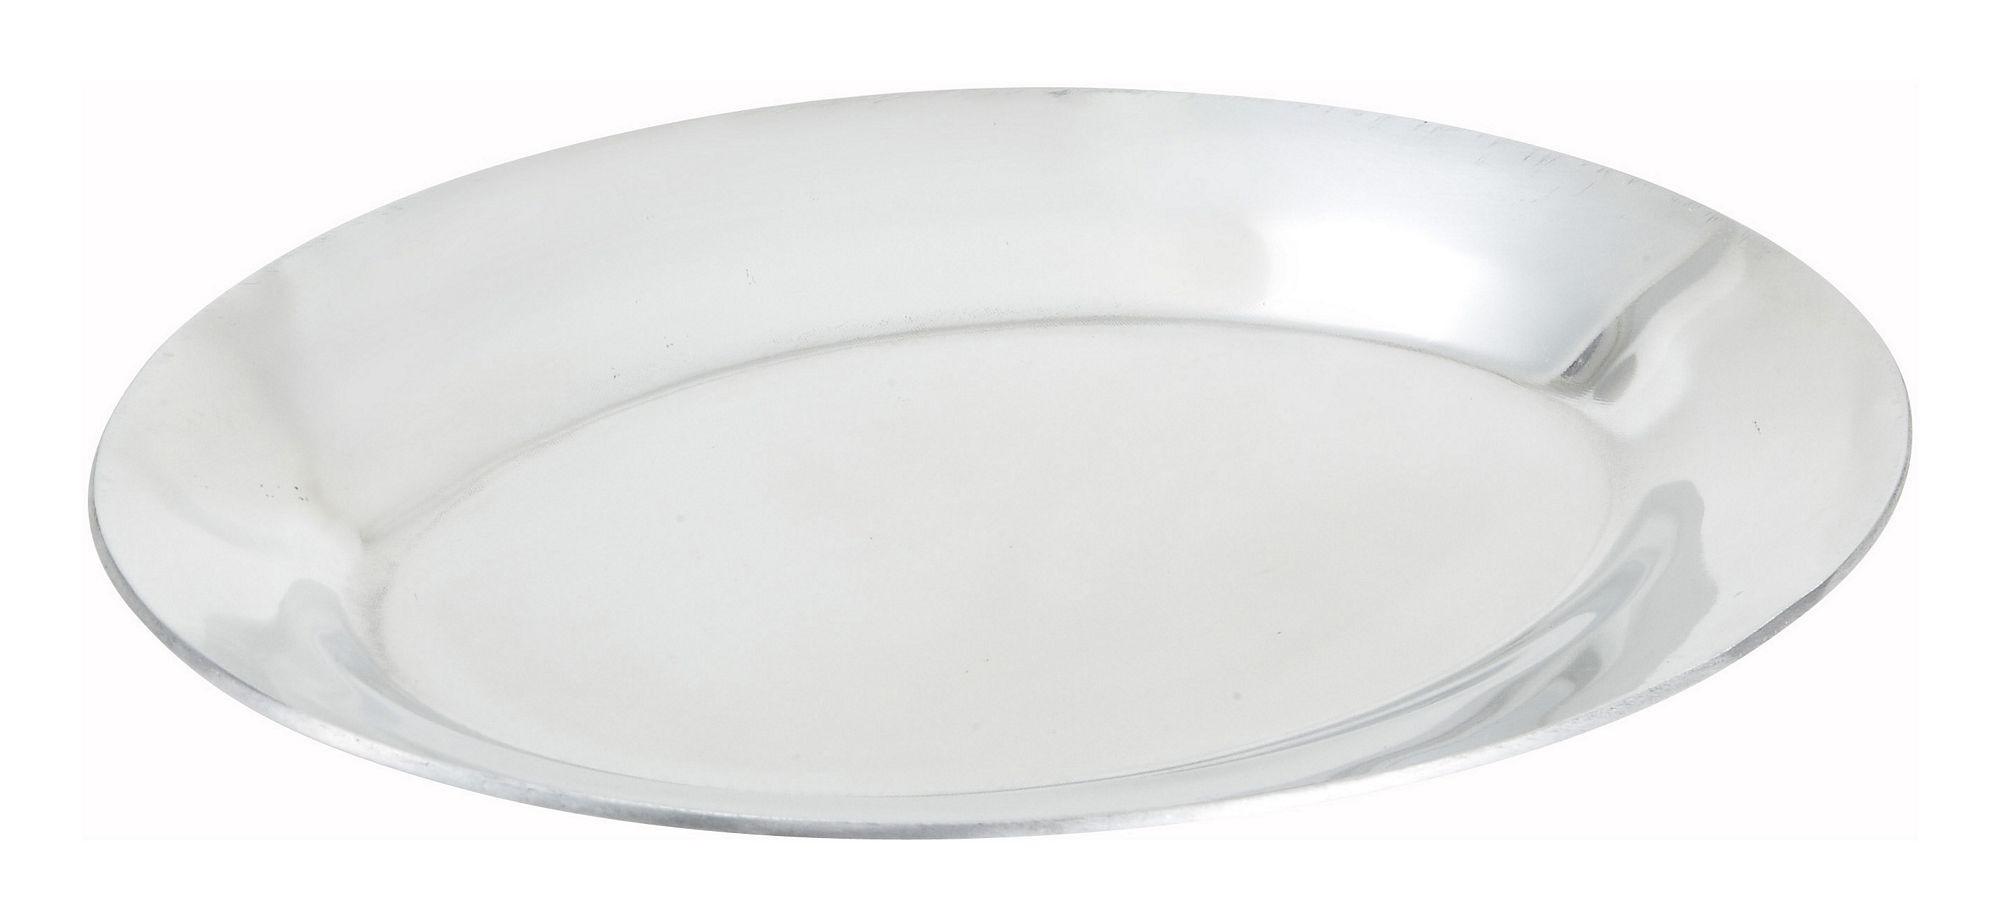 "Winco APL-10 Aluminum Oval Sizzling Platter, 10"""